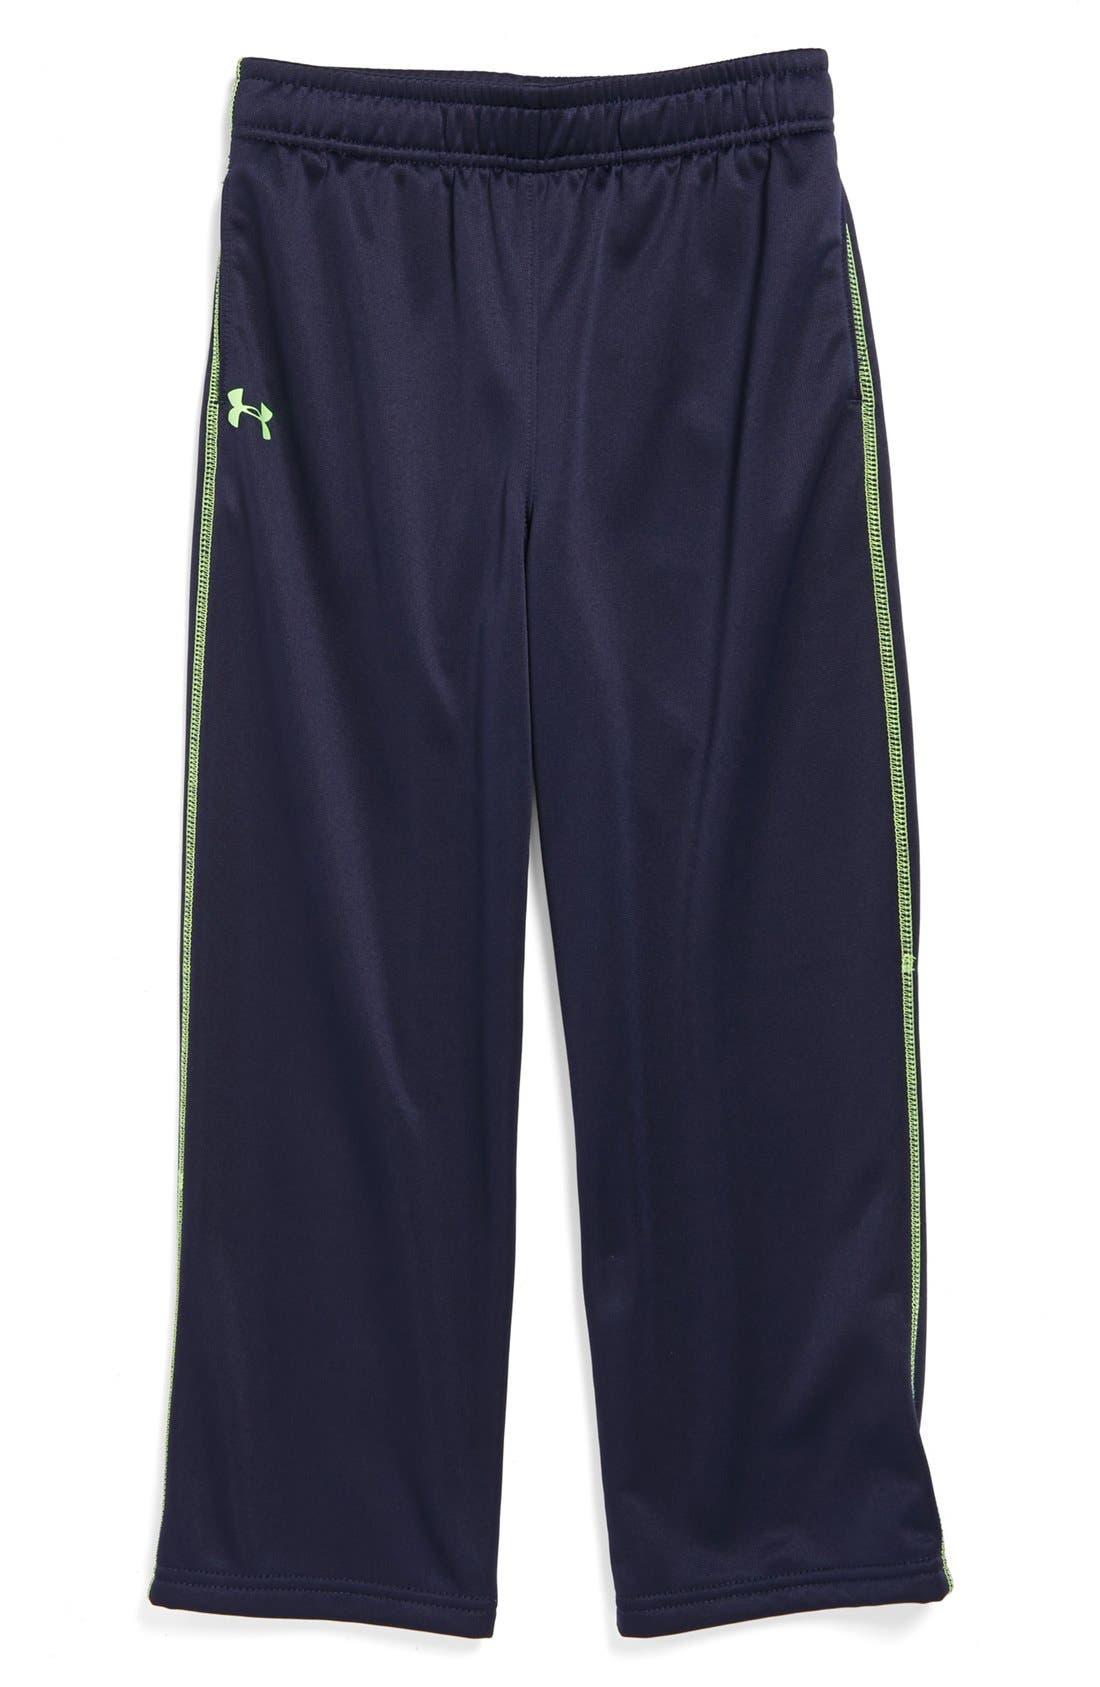 Main Image - Under Armour Fleece Lined AllSeasonGear® Pants (Little Boys)